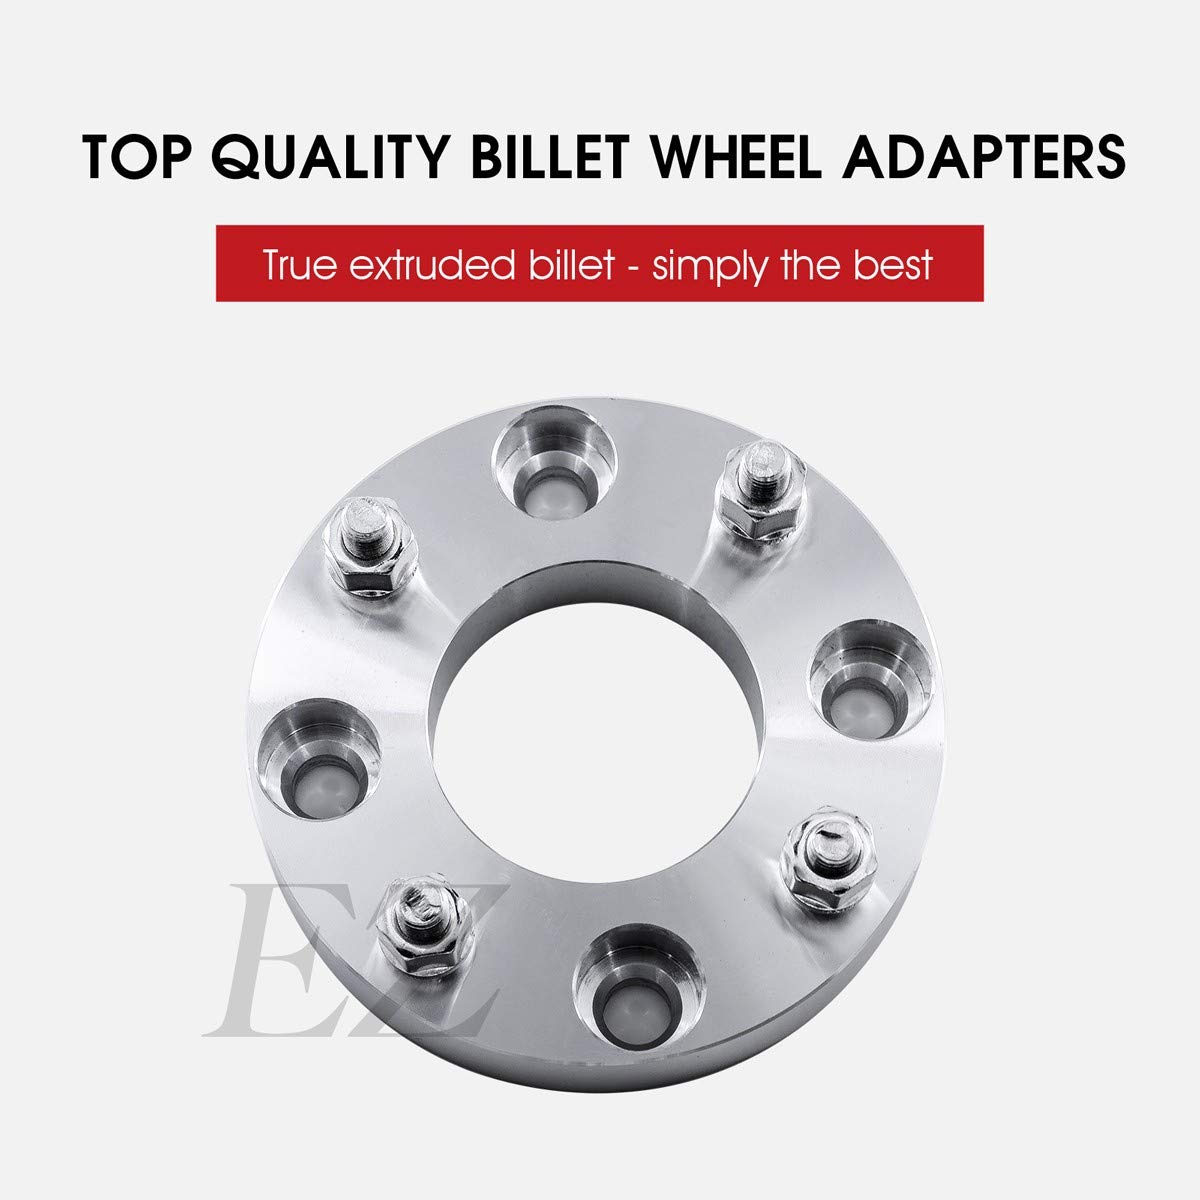 2 ATV Wheel Adapters 4x137 to 4x156 Thickness 1 Inch E Century